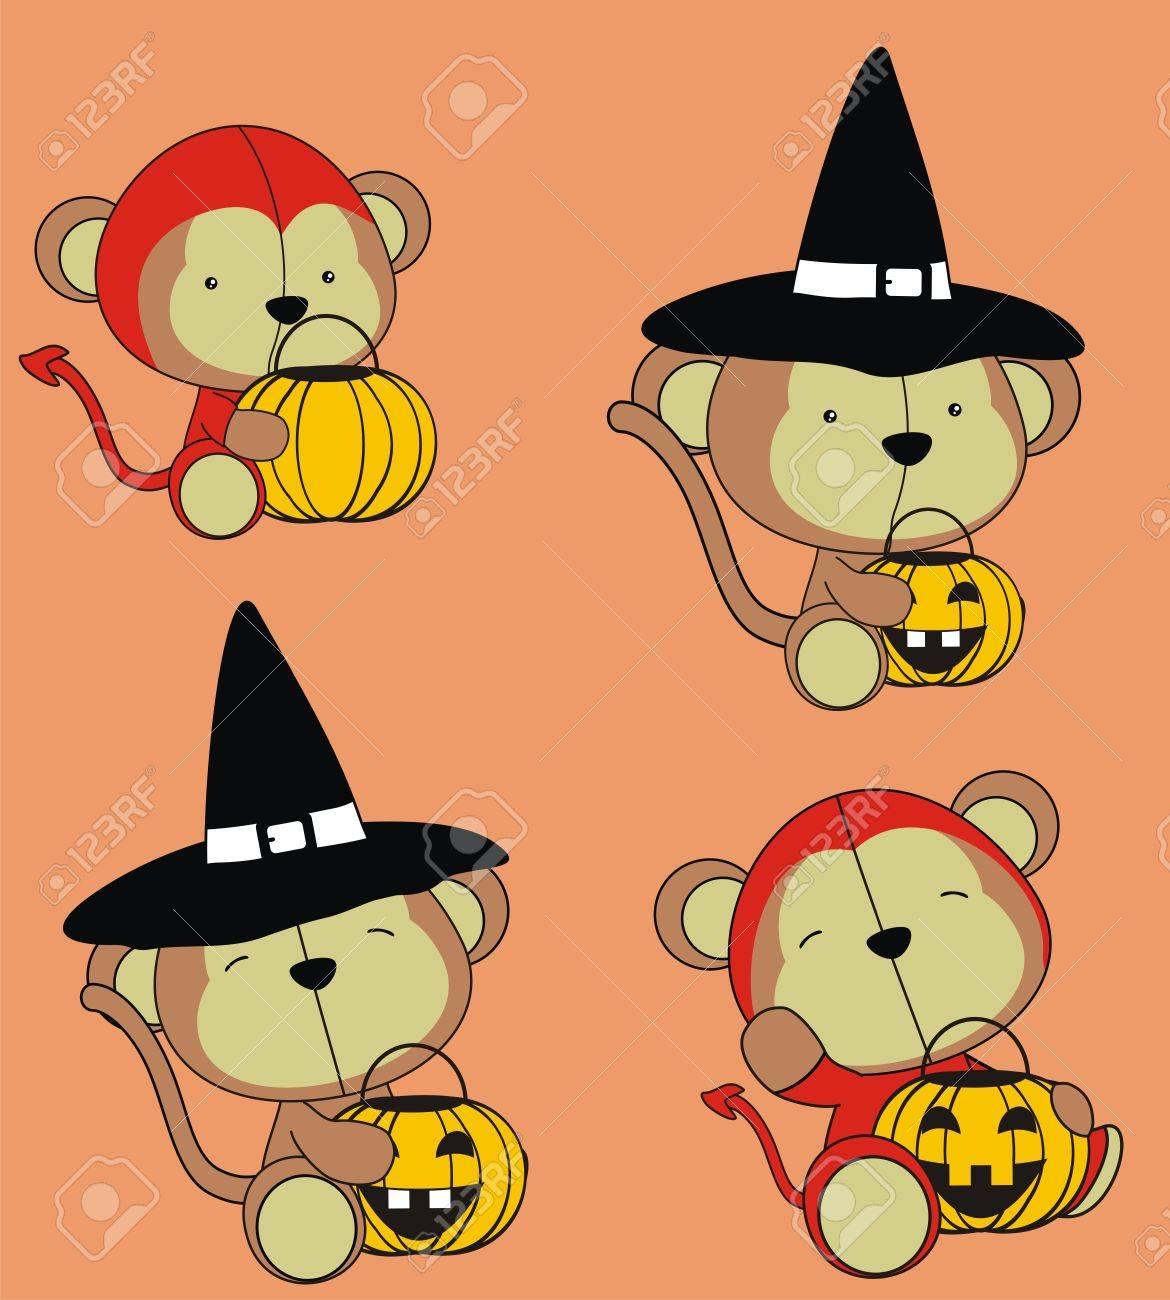 Monkey Baby Cartoon Halloween Set Royalty Free Cliparts, Vectors ...